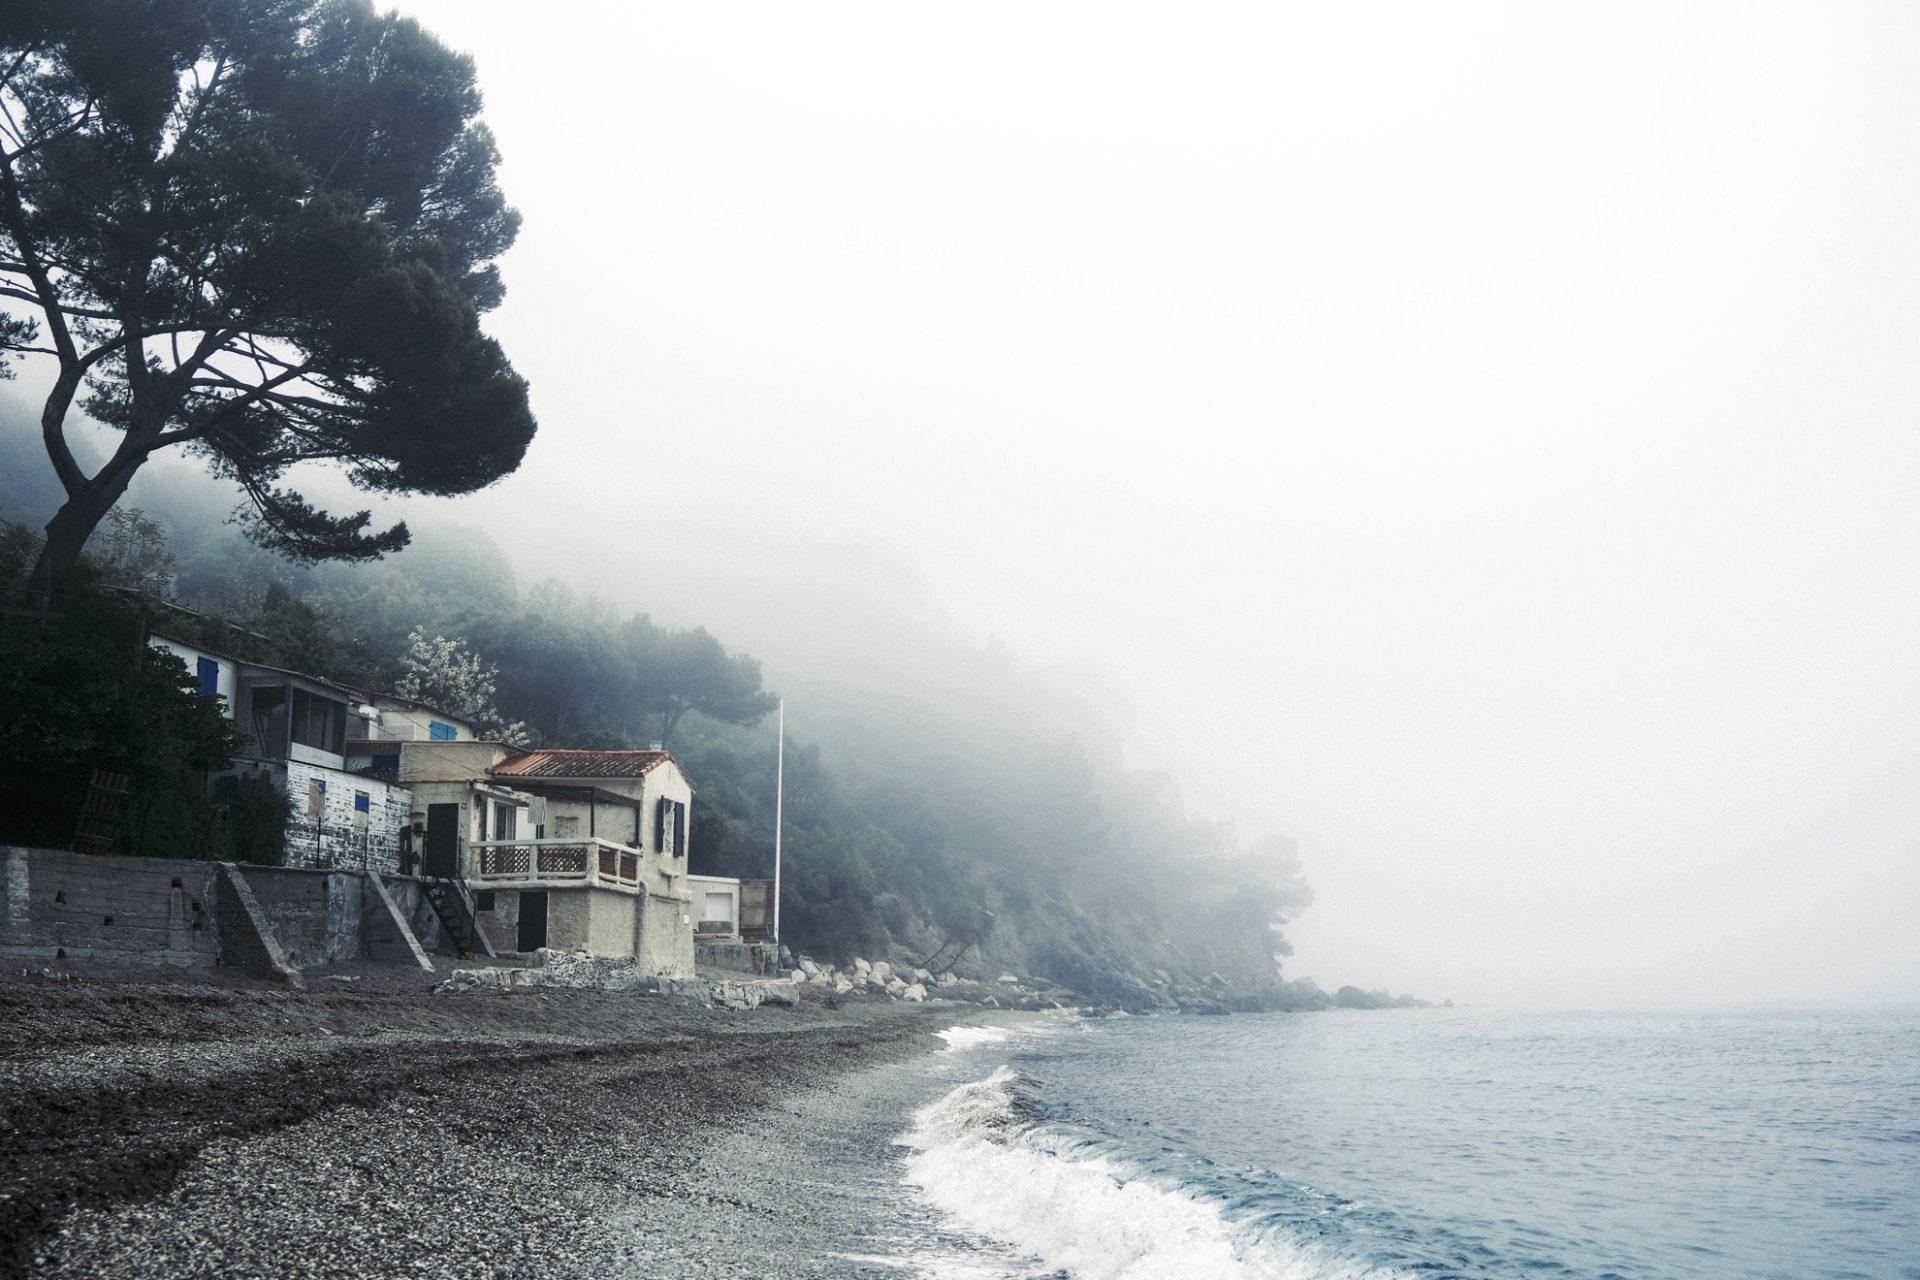 Fuji X100v pin de galle fog @laurentparienti-2